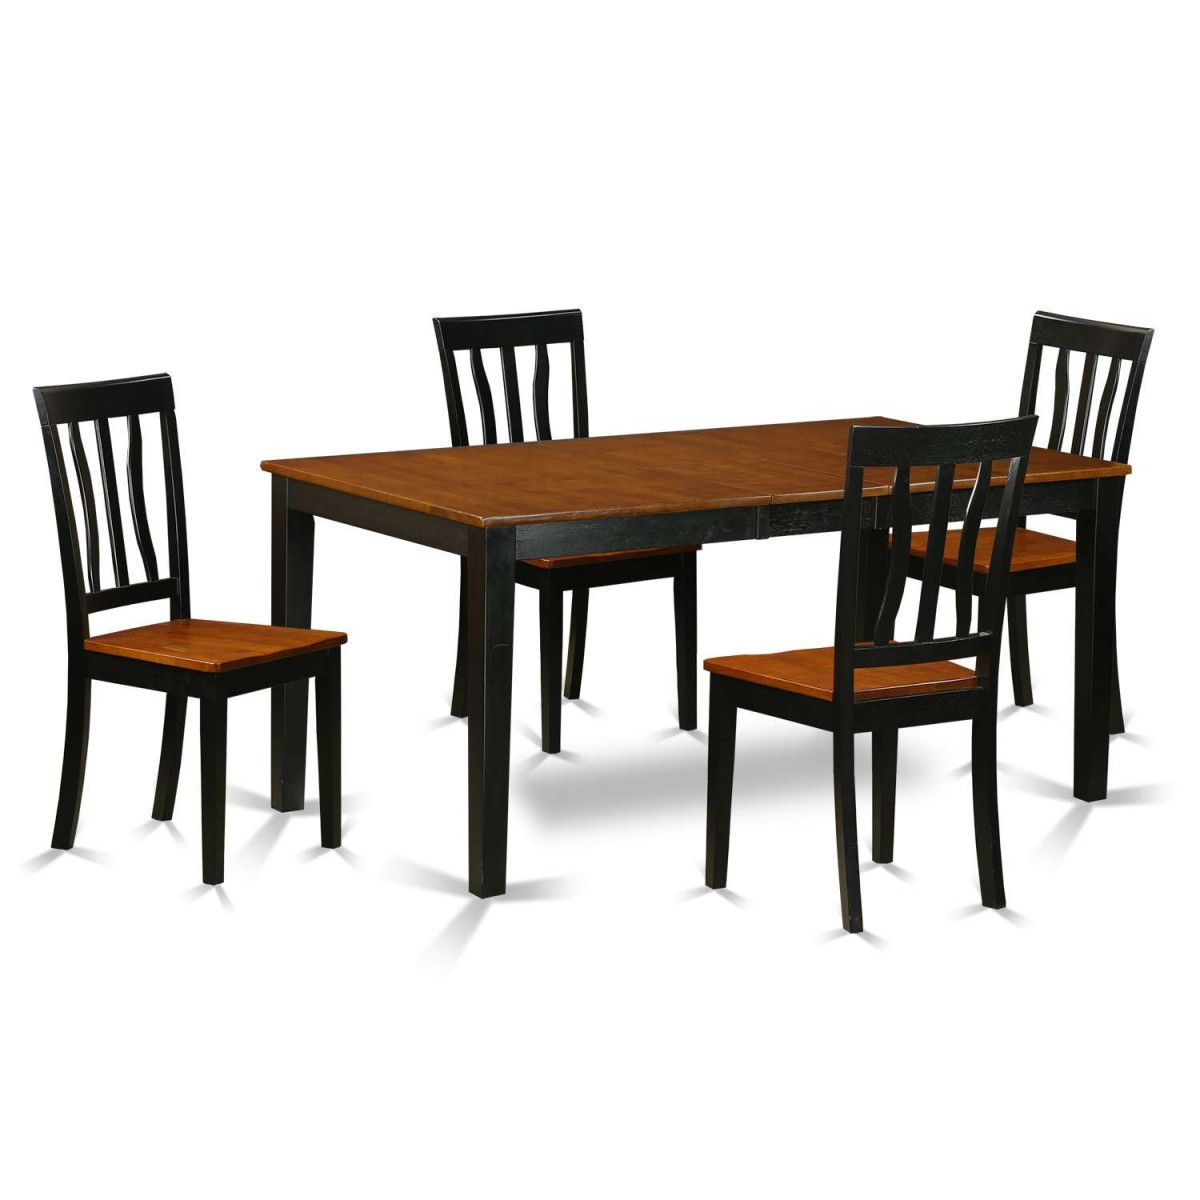 East West Nicoli 6 Piece Dining Set: East West Furniture Nicoli 5 Piece Kitchen Table Set